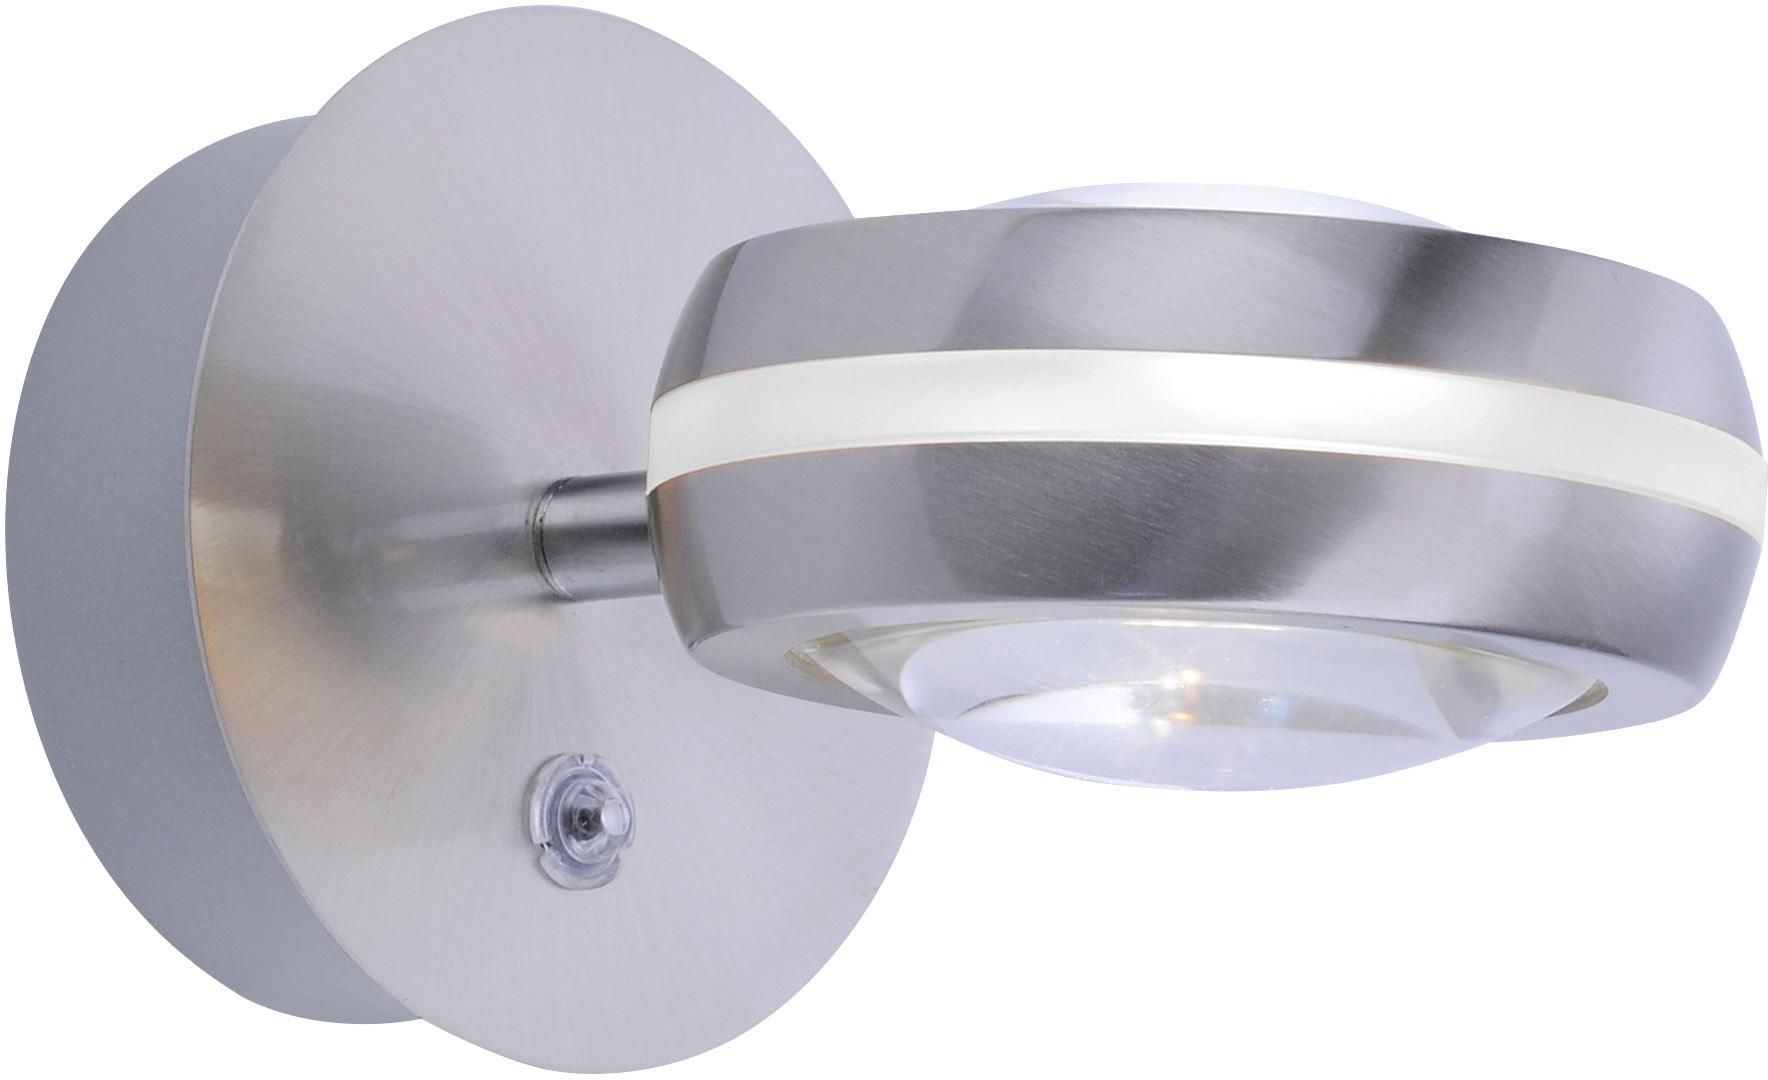 TRIO Leuchten LED Wandleuchte VISTA, LED-Board, 1 St., Farbwechsler